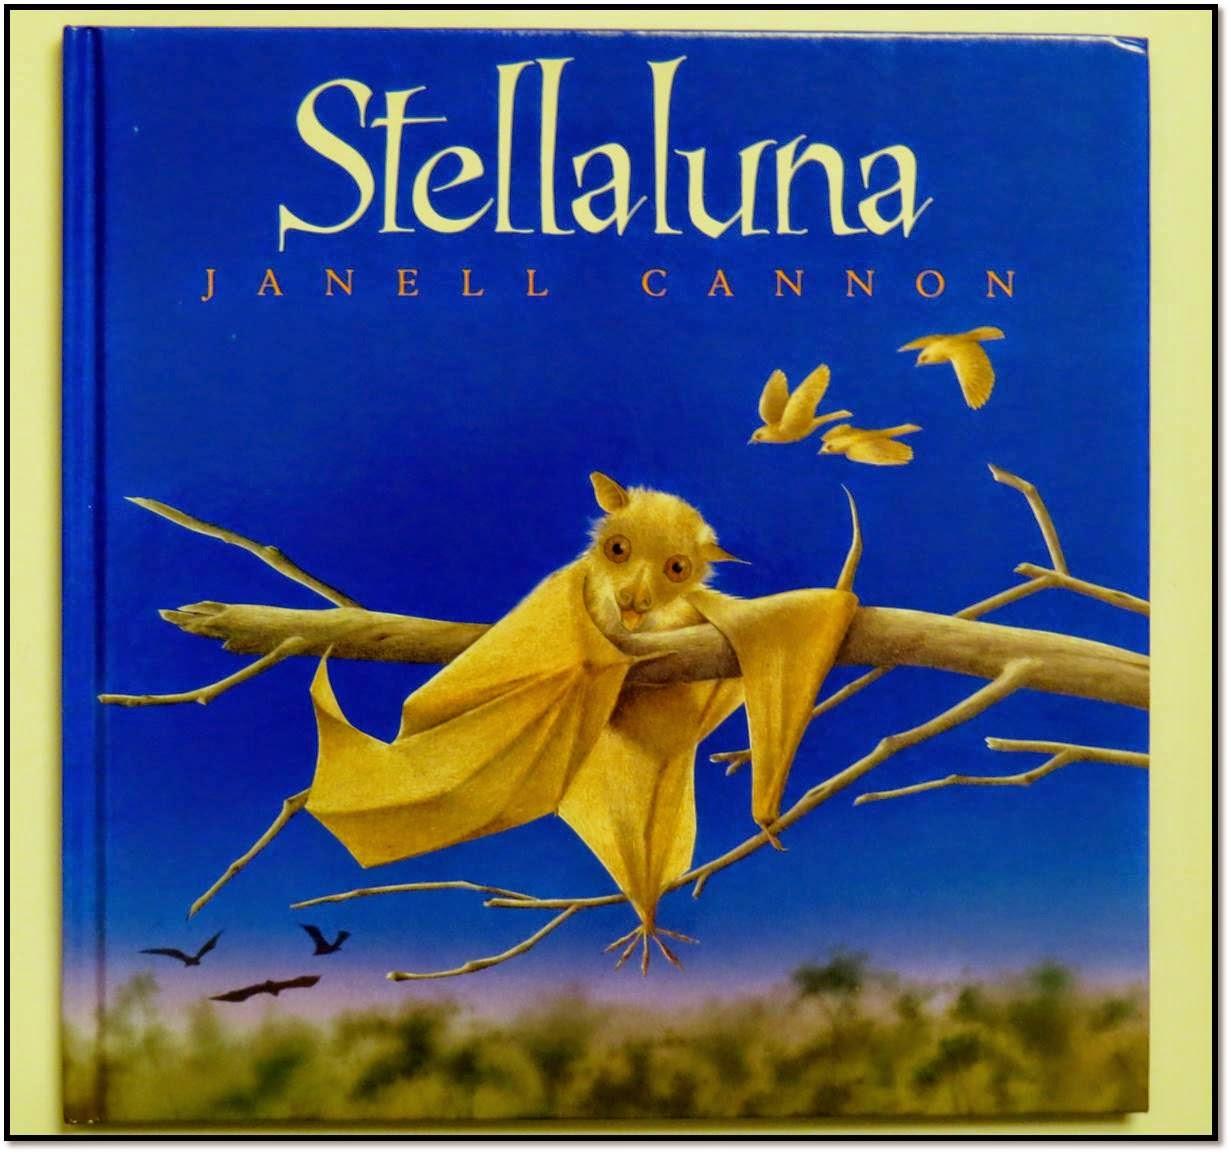 https://www.amazon.com/Stellaluna-Janell-Cannon/dp/0152802177/ref=sr_1_1?ie=UTF8&qid=1483852056&sr=8-1&keywords=stellaluna+book